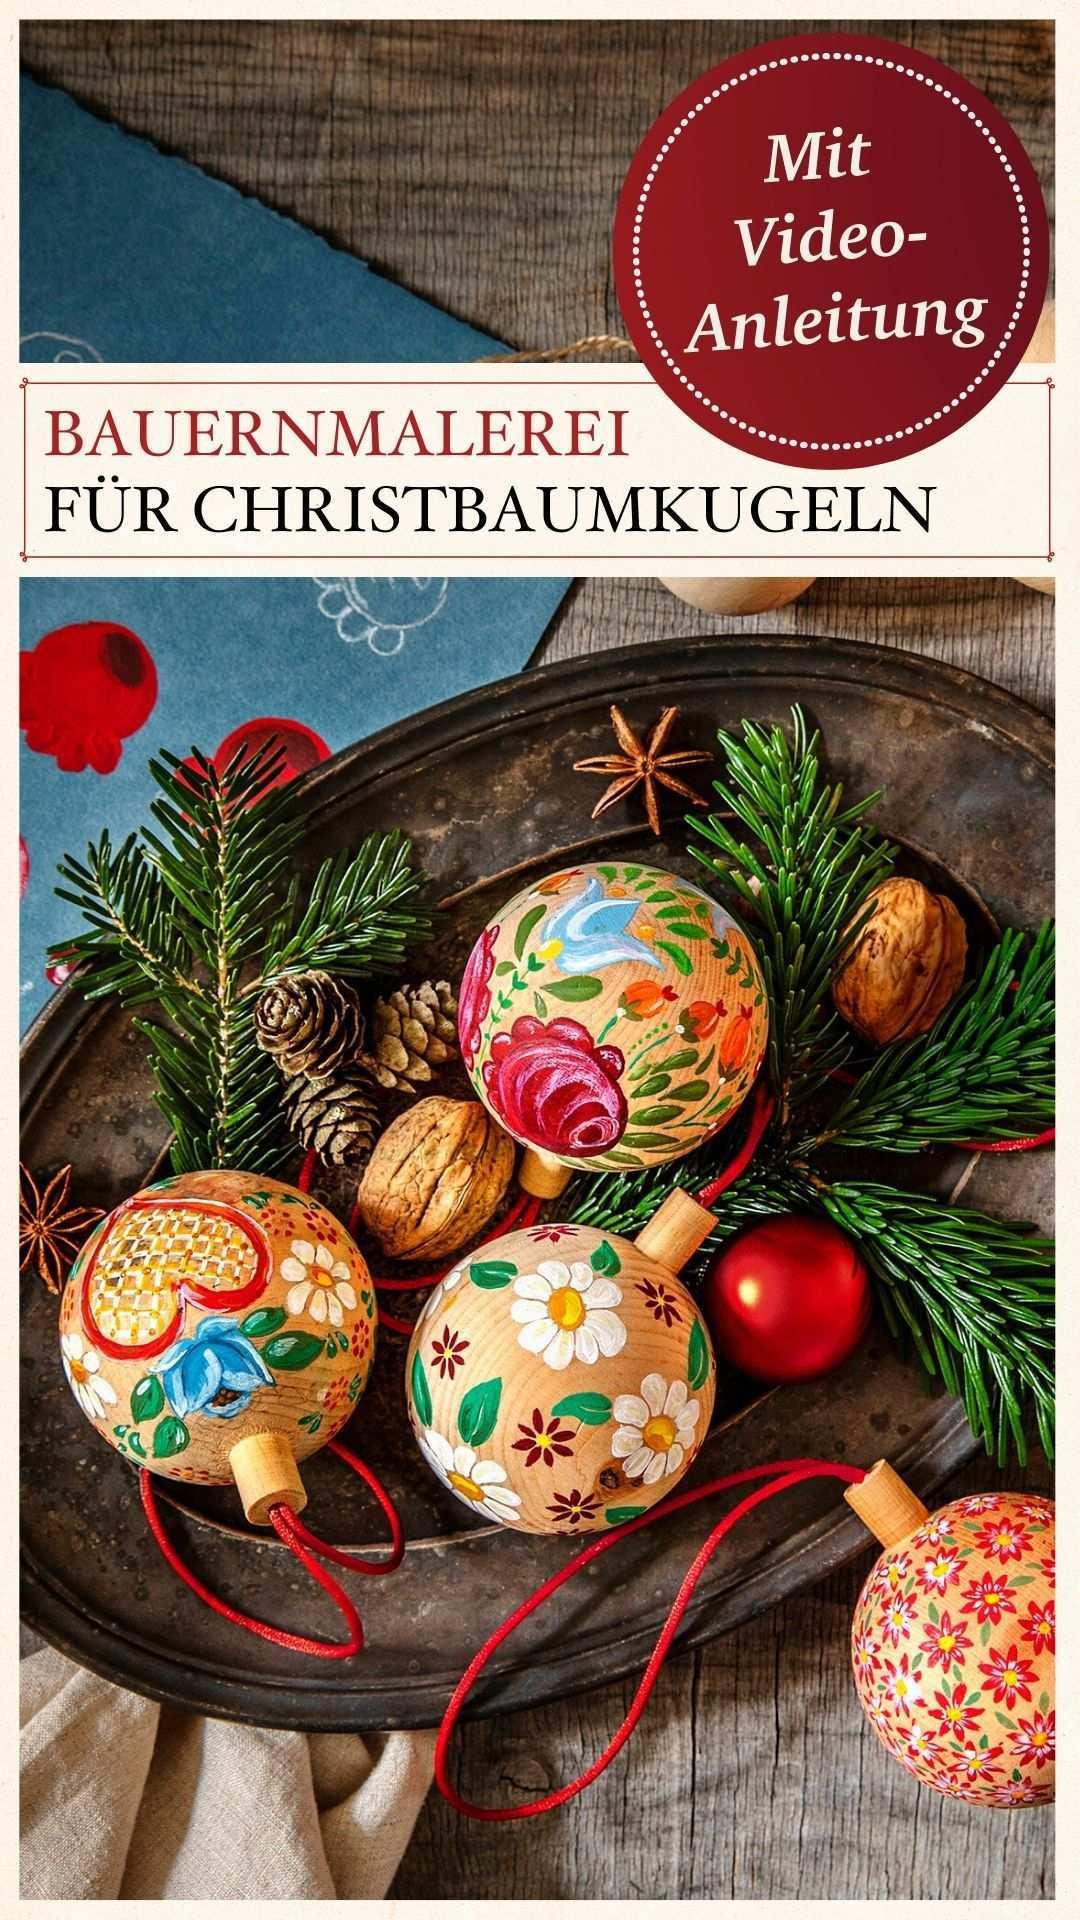 Bauernmalerei Fur Christbaumkugeln In 2020 Christbaumkugeln Bauernmalerei Selbermachen